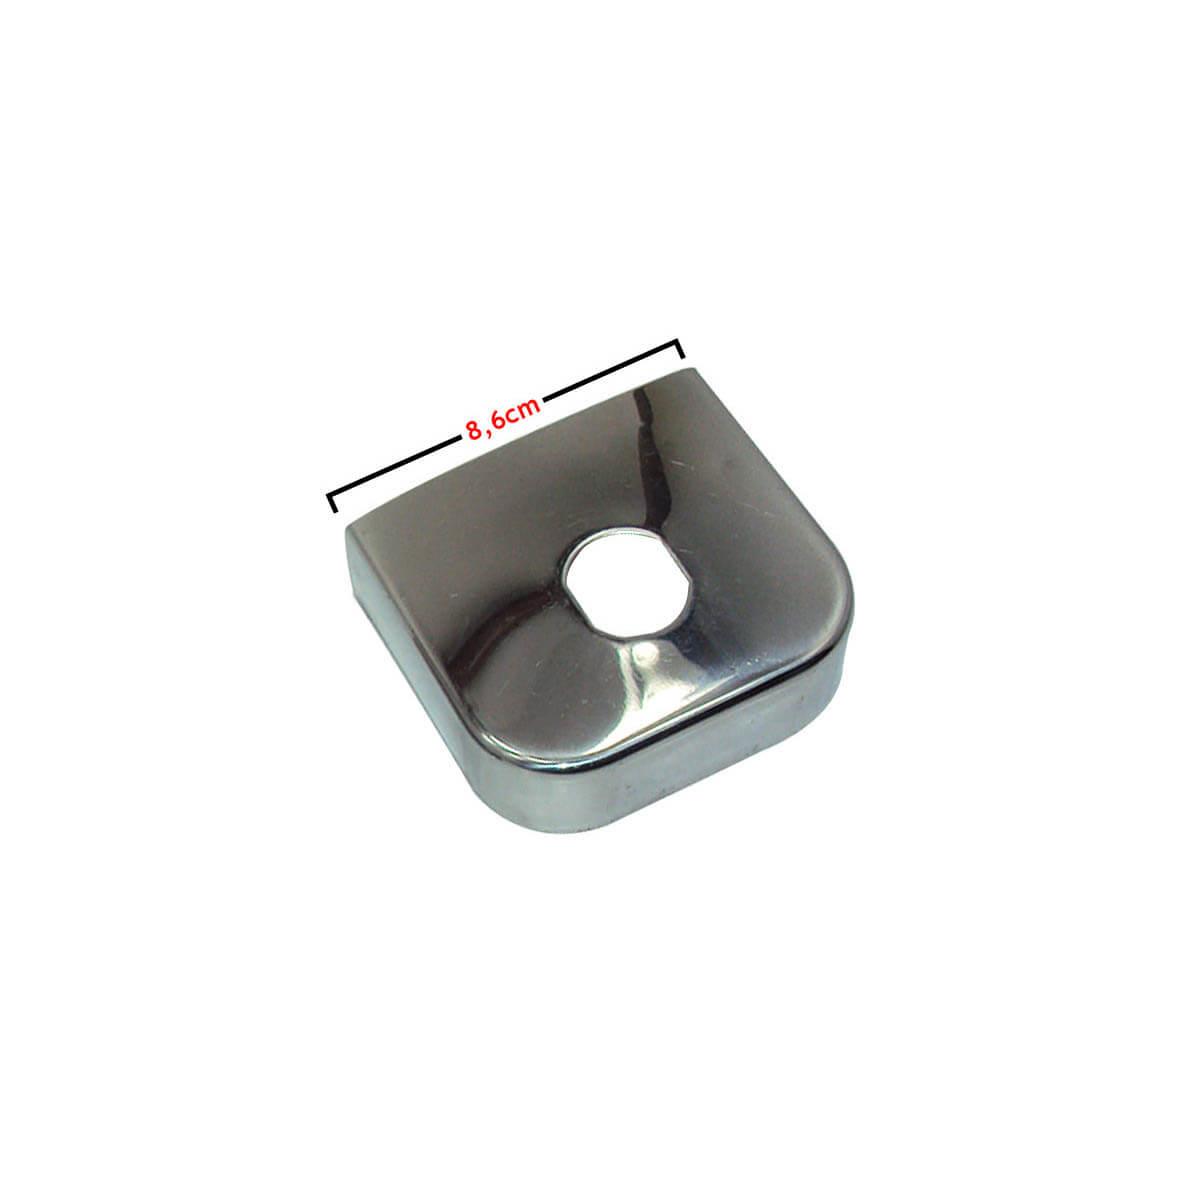 Capa inox para engate de reboque 8,6 cm de largura